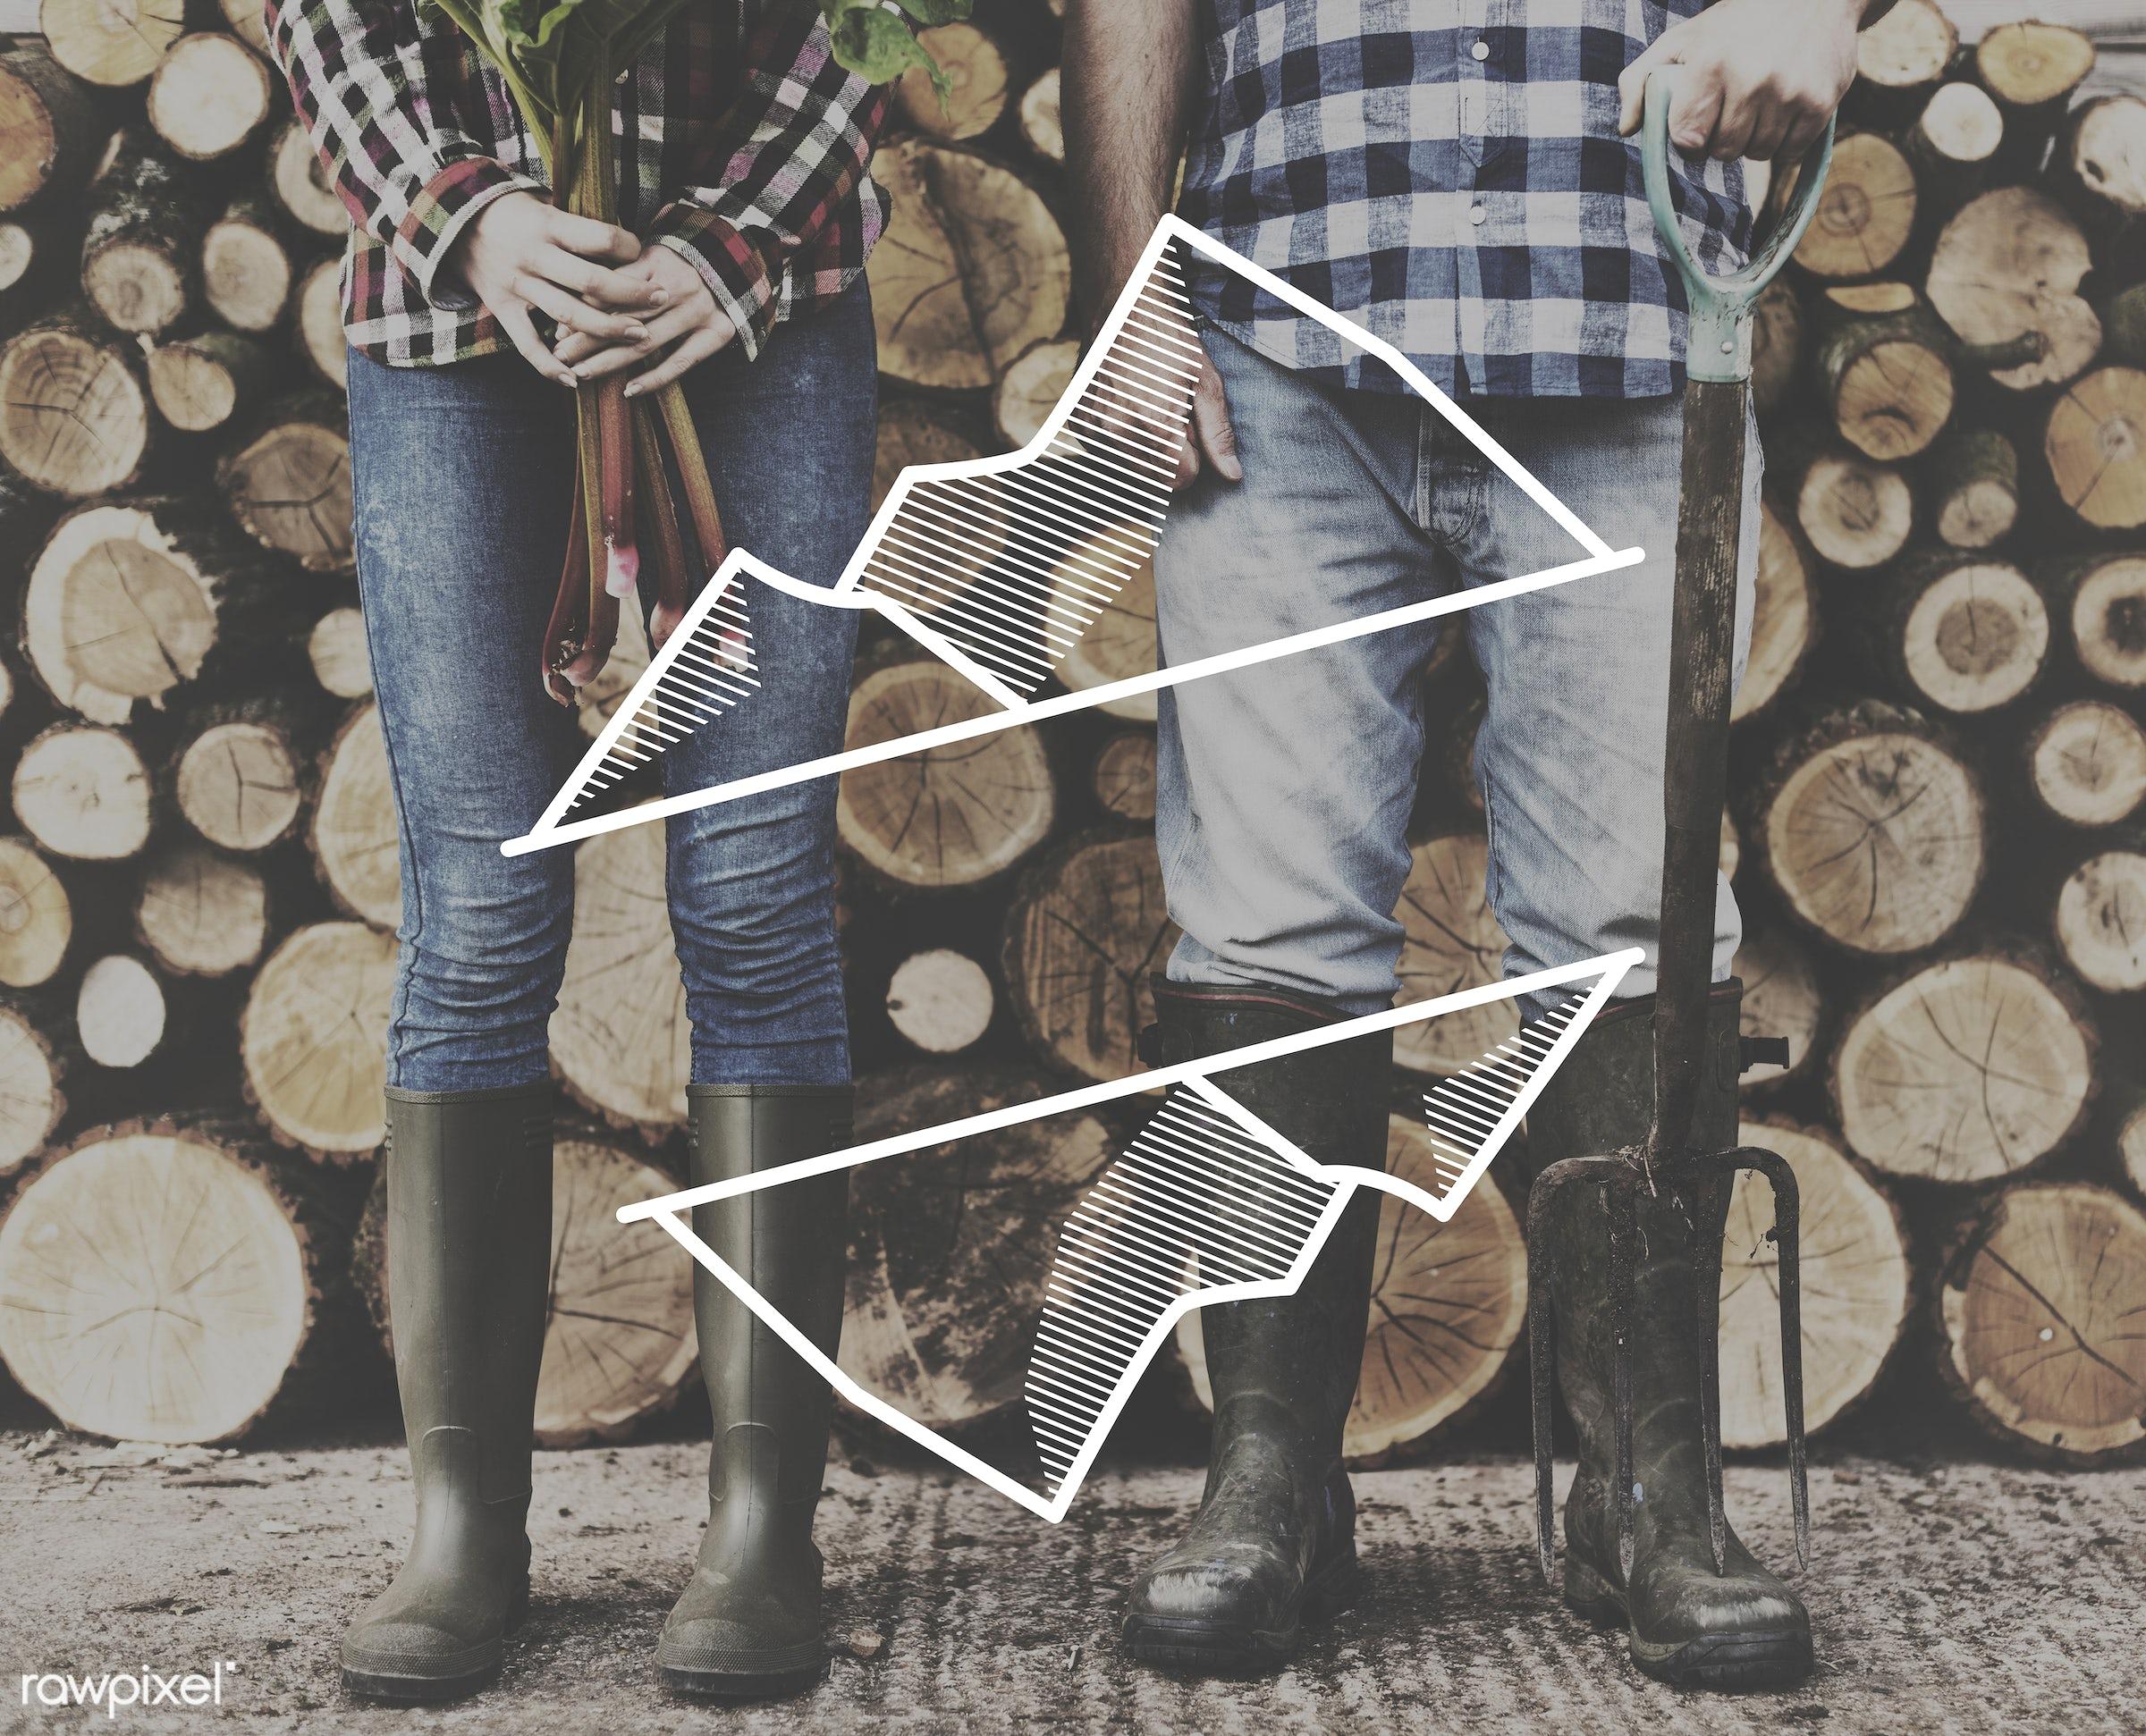 badge, banner, blank, caucasian, copy space, farm, farmer, firewood, hands, holding, jeans, journey, label, legs, log,...